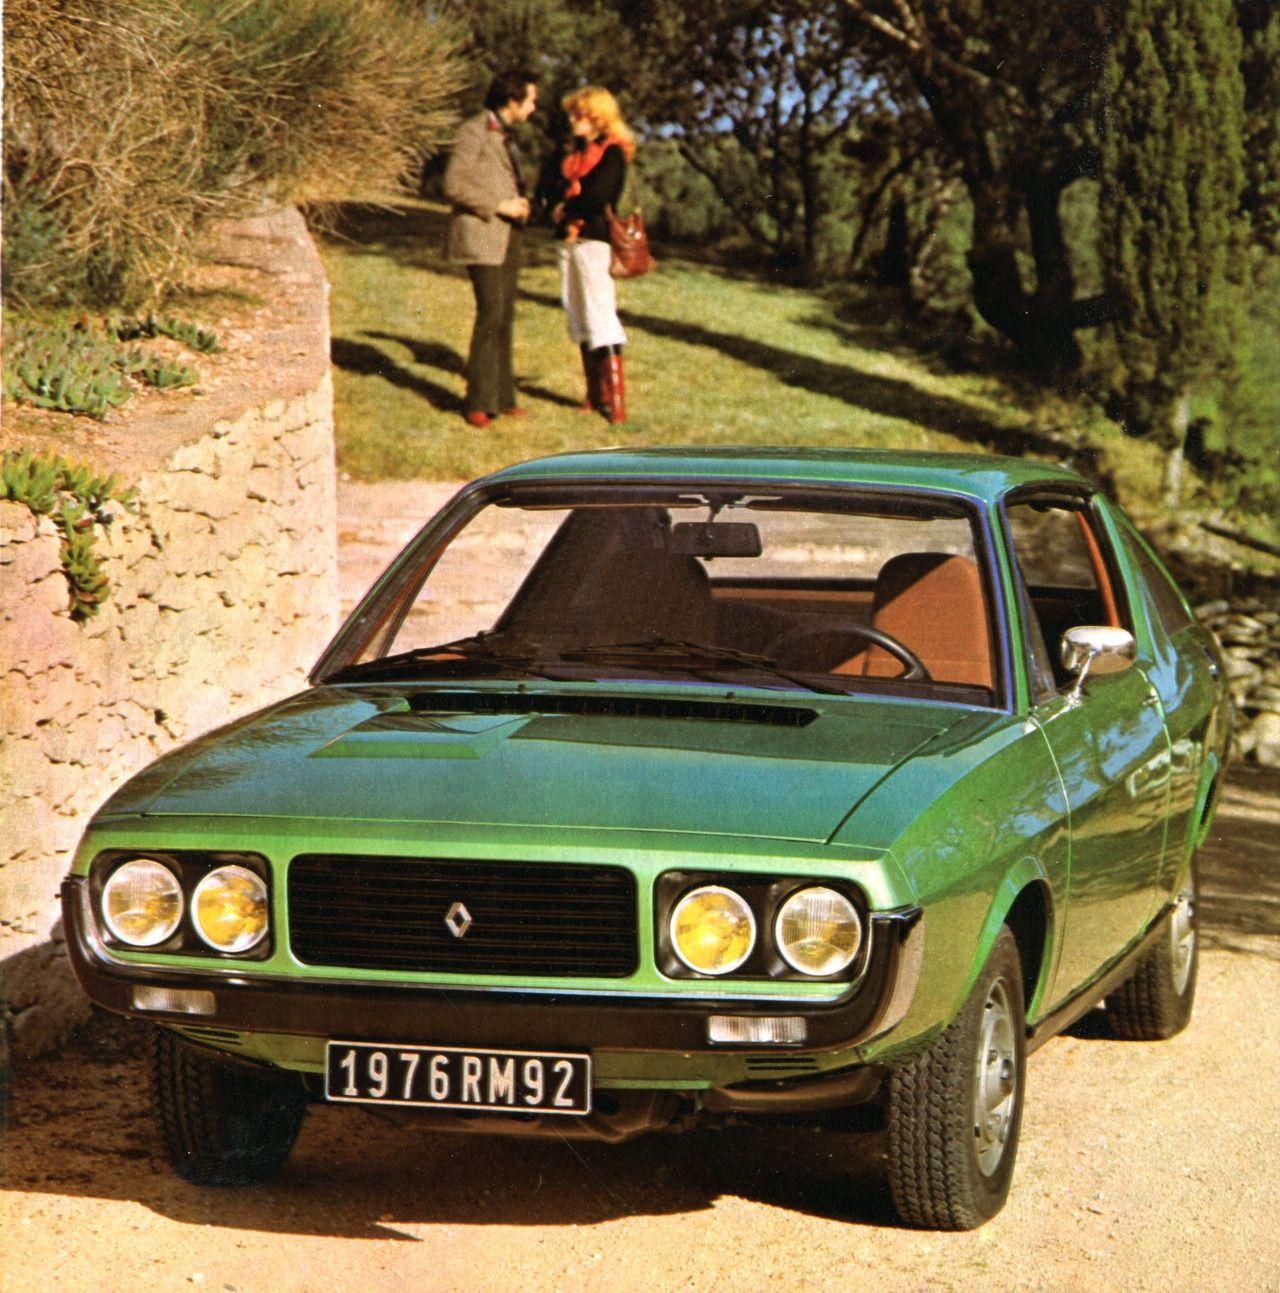 renault 17 ts l automobile mars 1976 retro motro pinterest automobile cars and classic. Black Bedroom Furniture Sets. Home Design Ideas